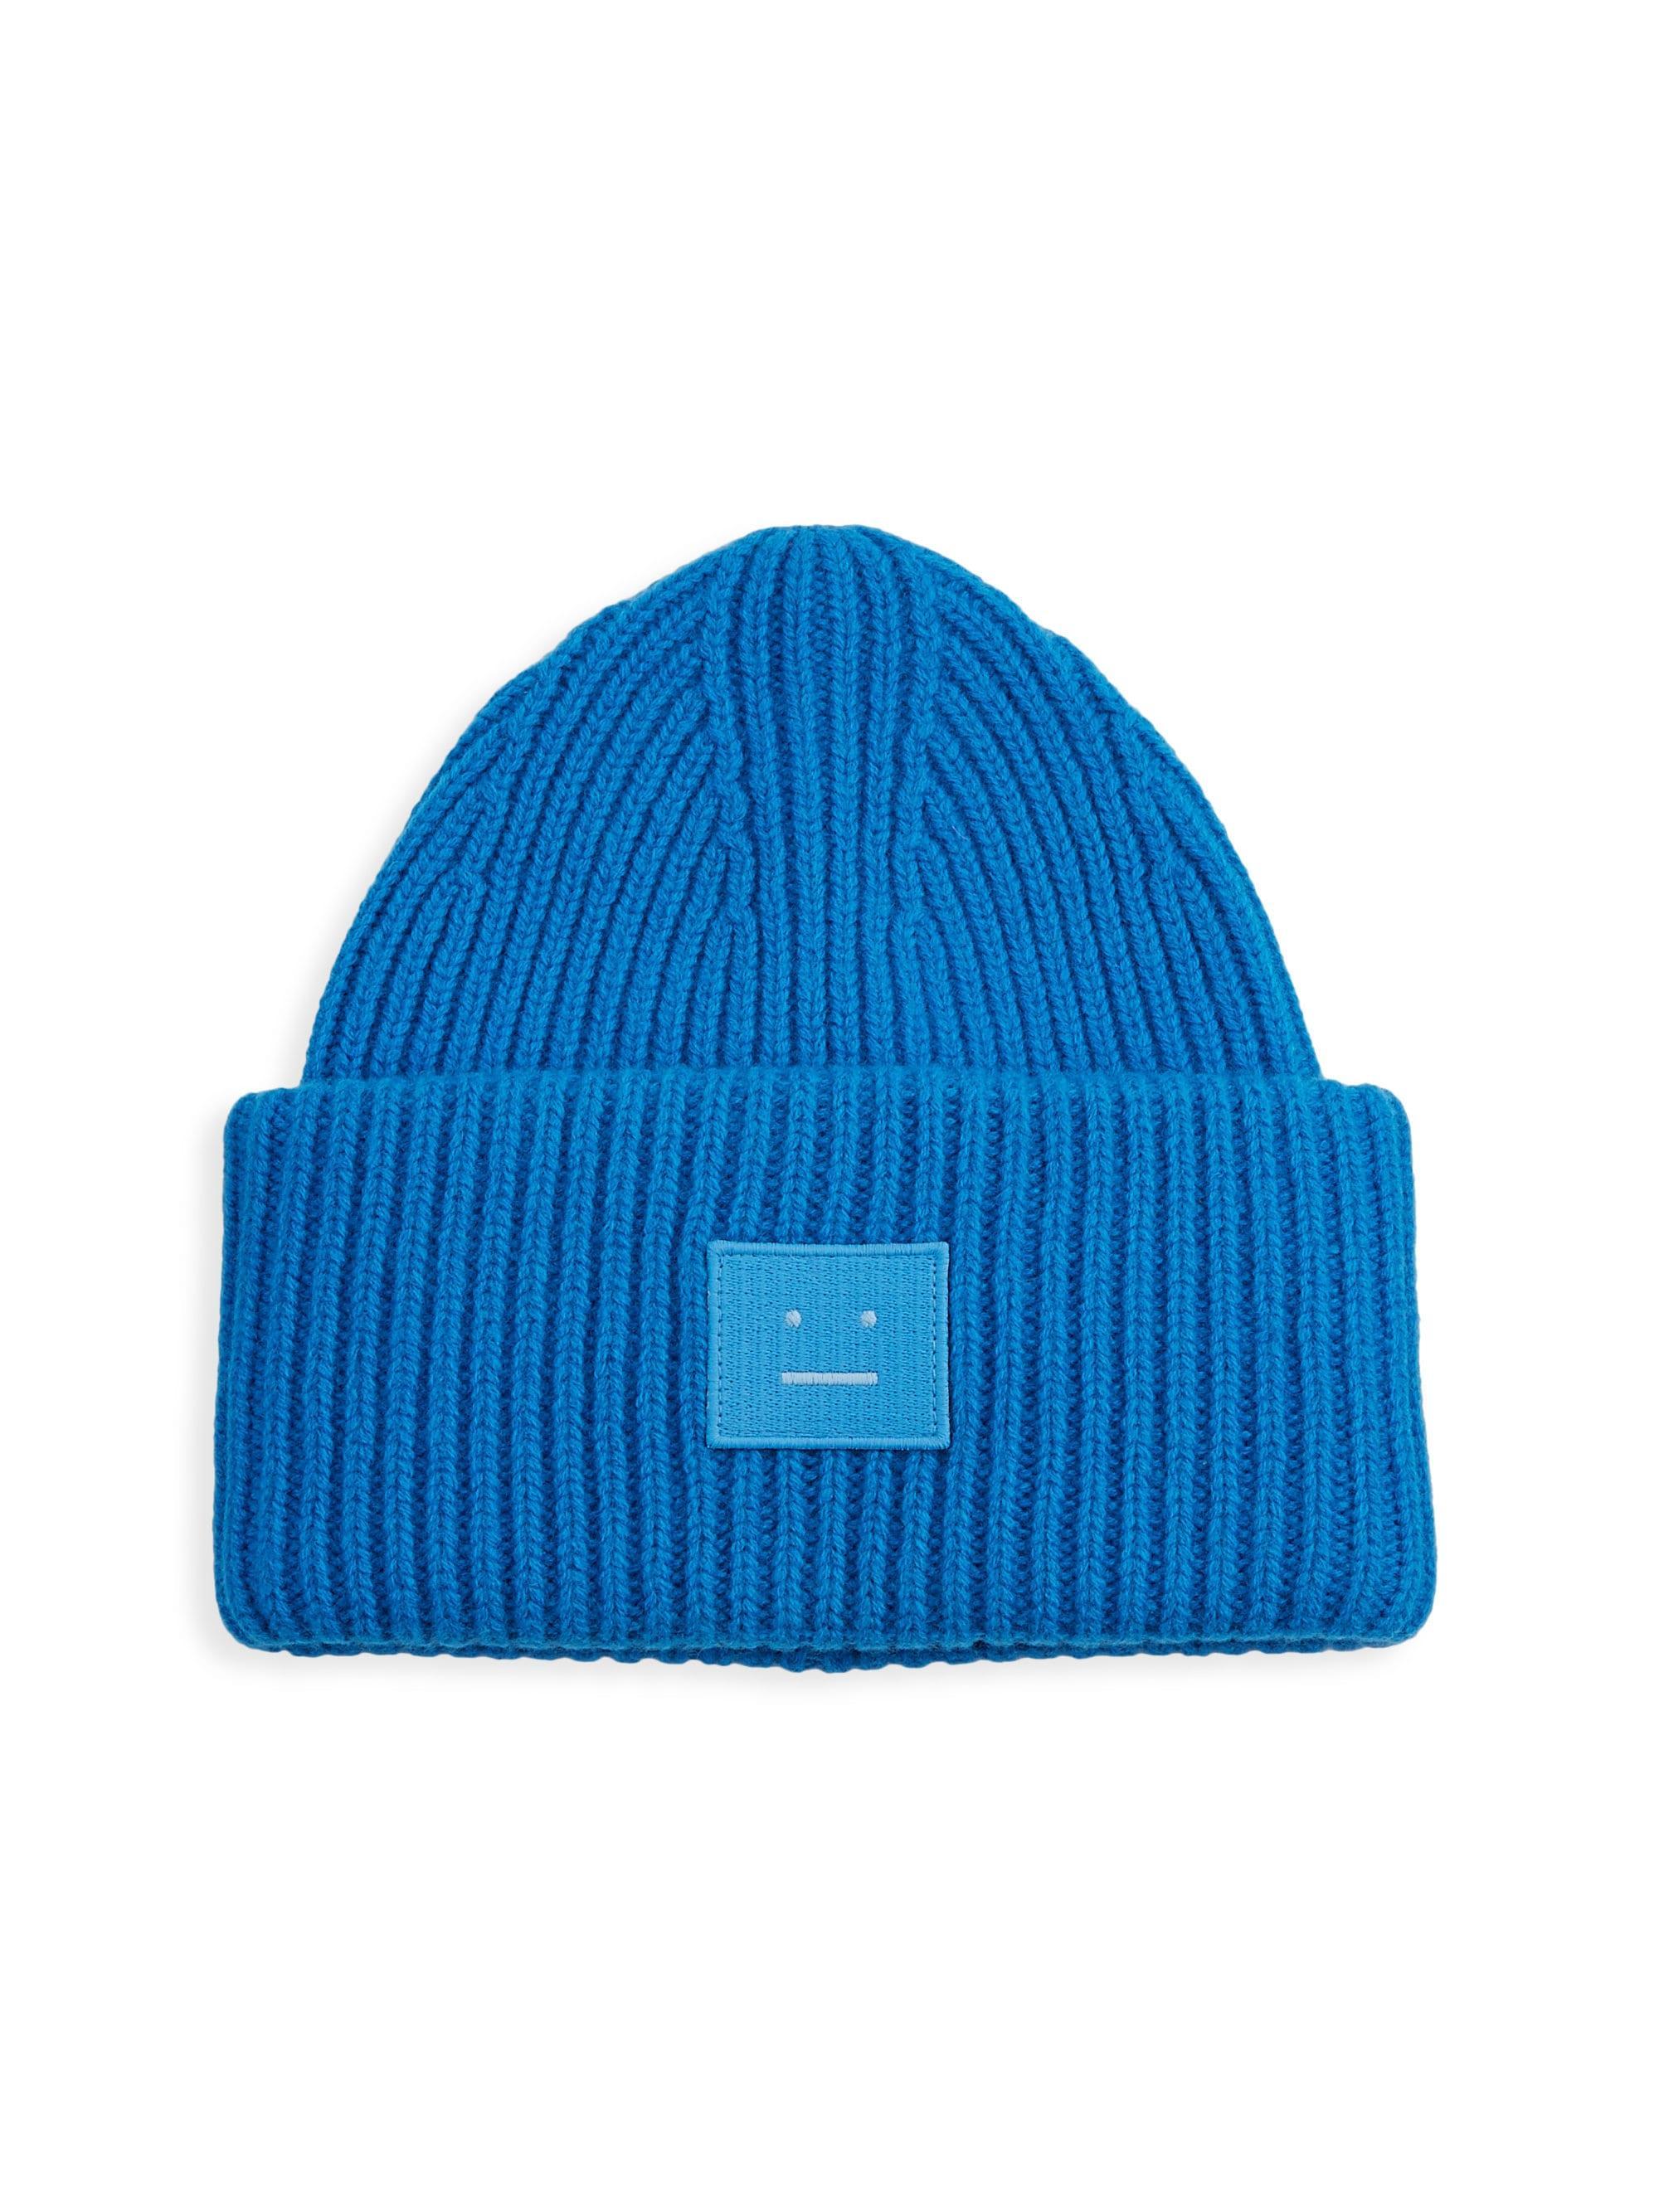 dfe4327d8fd462 Lyst - Acne Studios Men's Pansy N Face Wool-blend Beanie - Charcoal ...